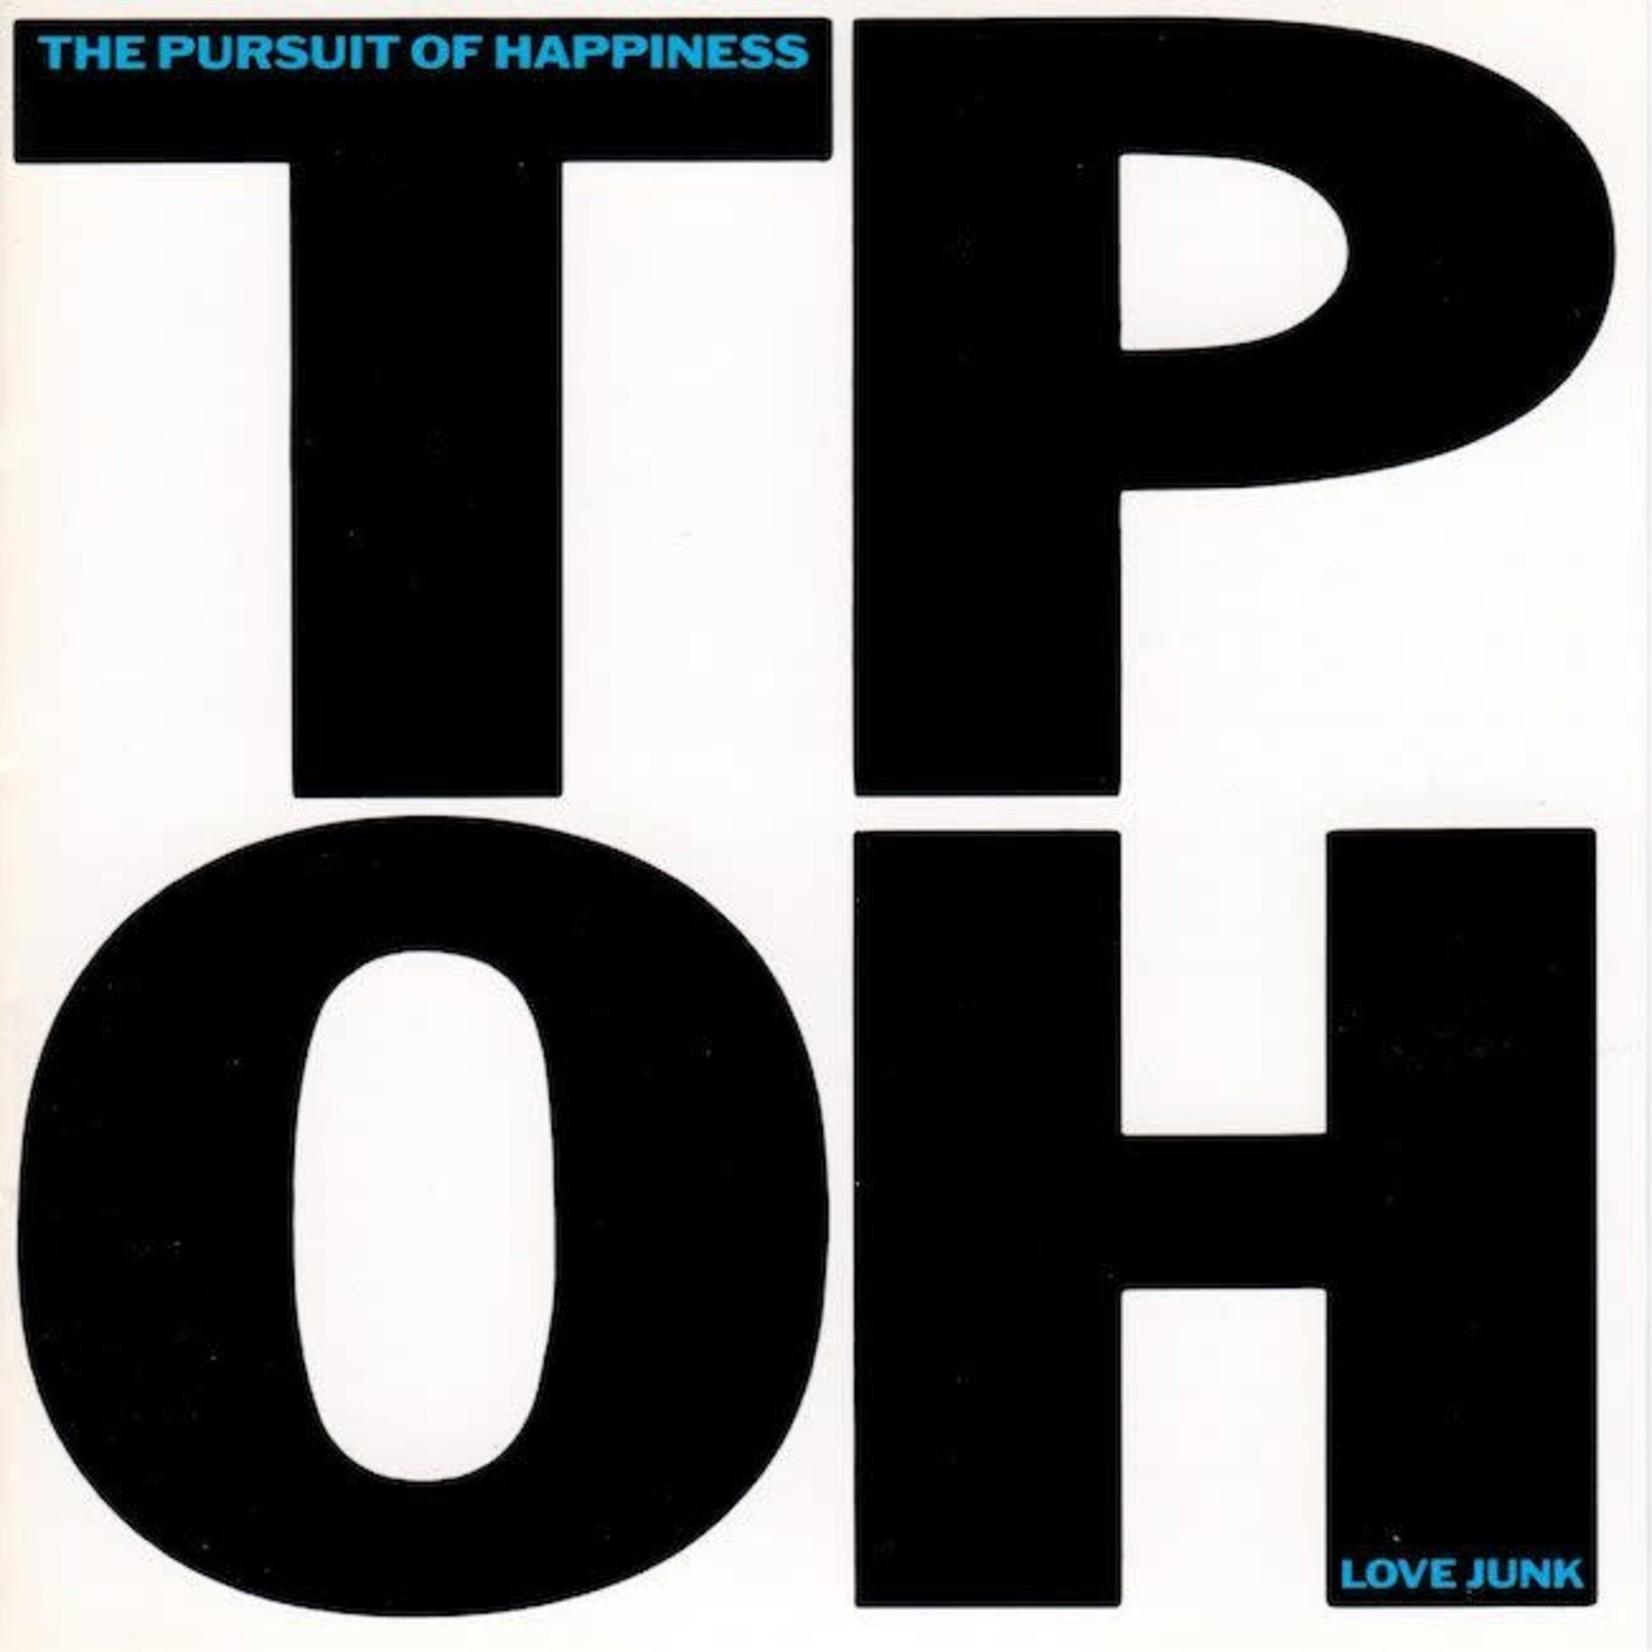 [Vintage] Pursuit of Happiness: Love Junk